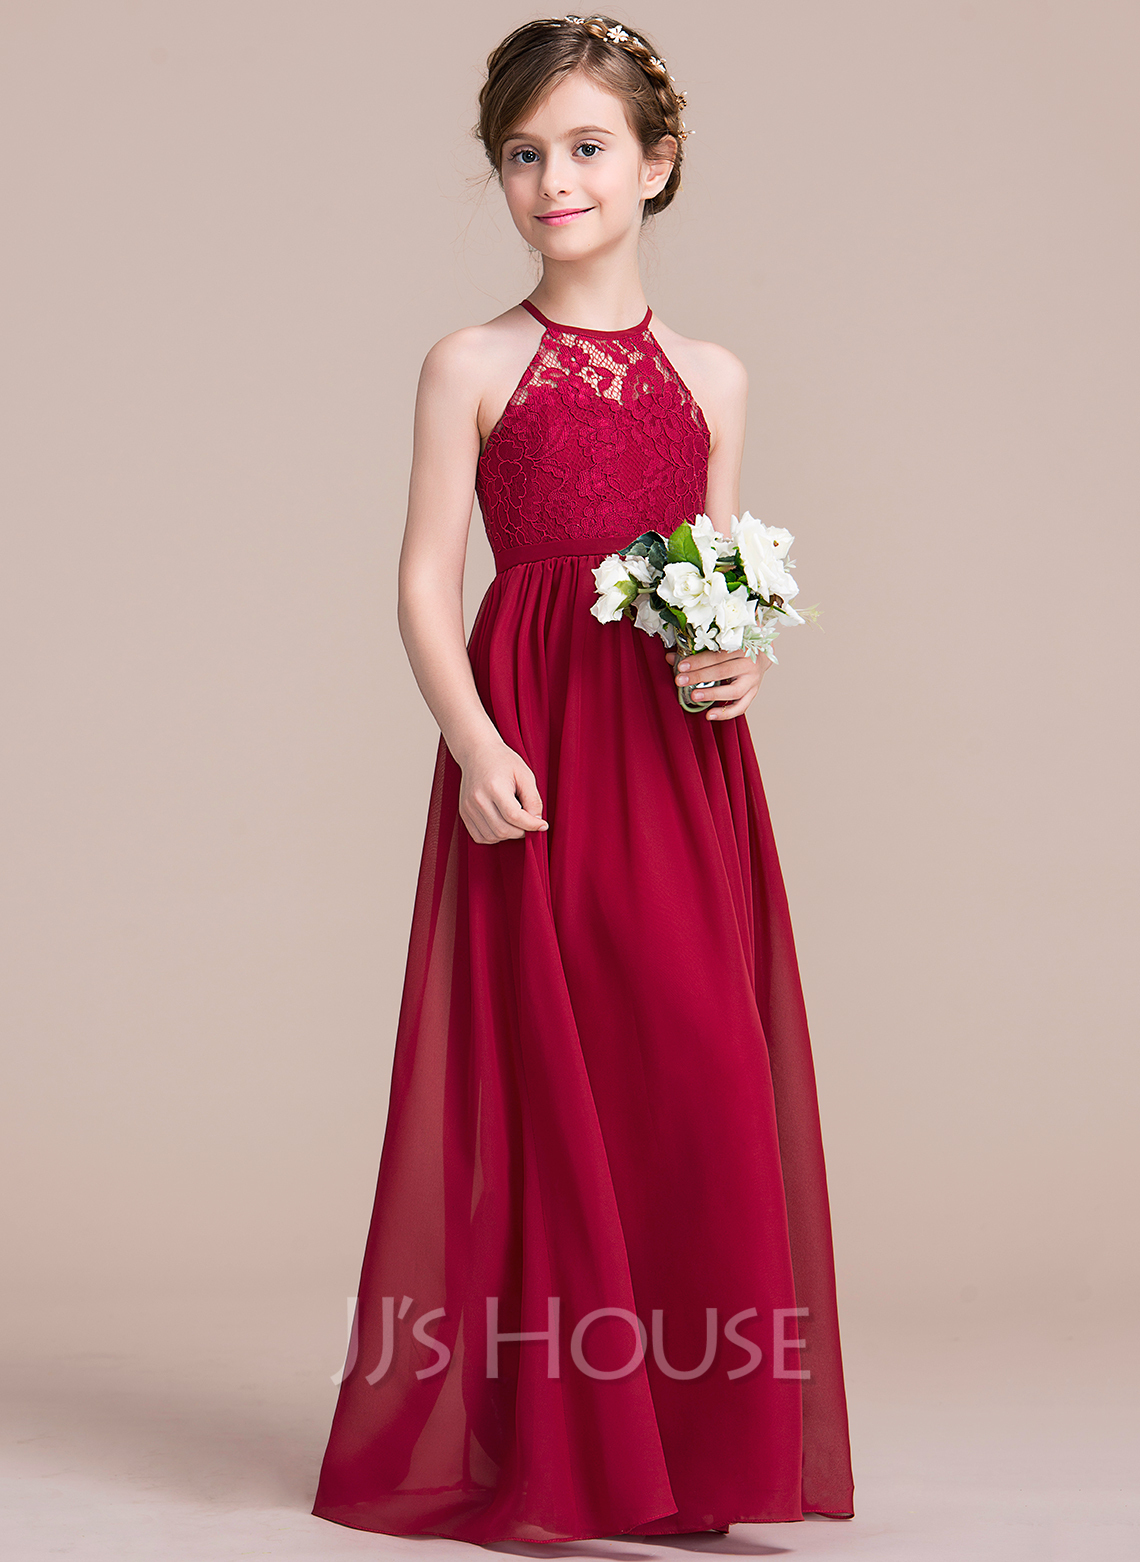 A-Line Floor-length Flower Girl Dress - Chiffon/Lace Sleeveless Scoop Neck